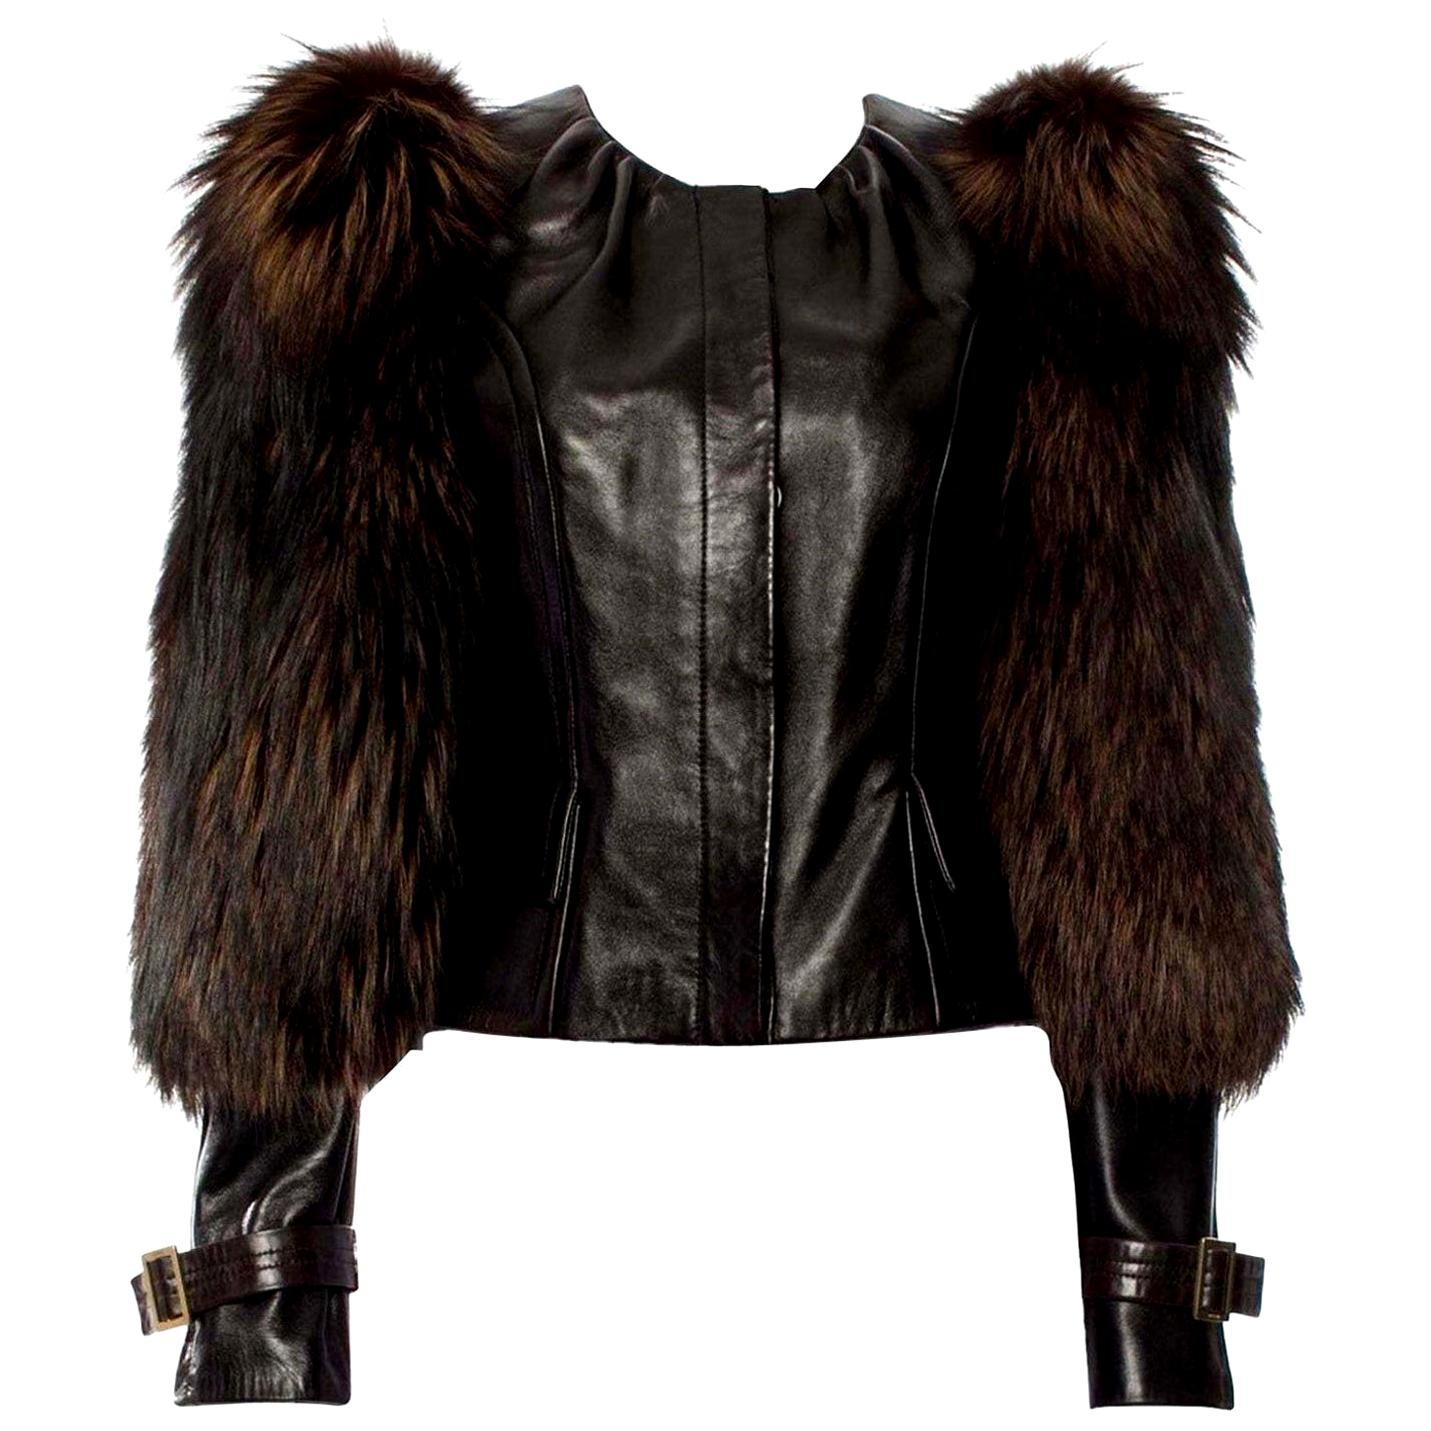 New Rare Tom Ford for Gucci F/W 2003 Fox Fur Runway Ad Jacket Coat Sz 40 $9,650